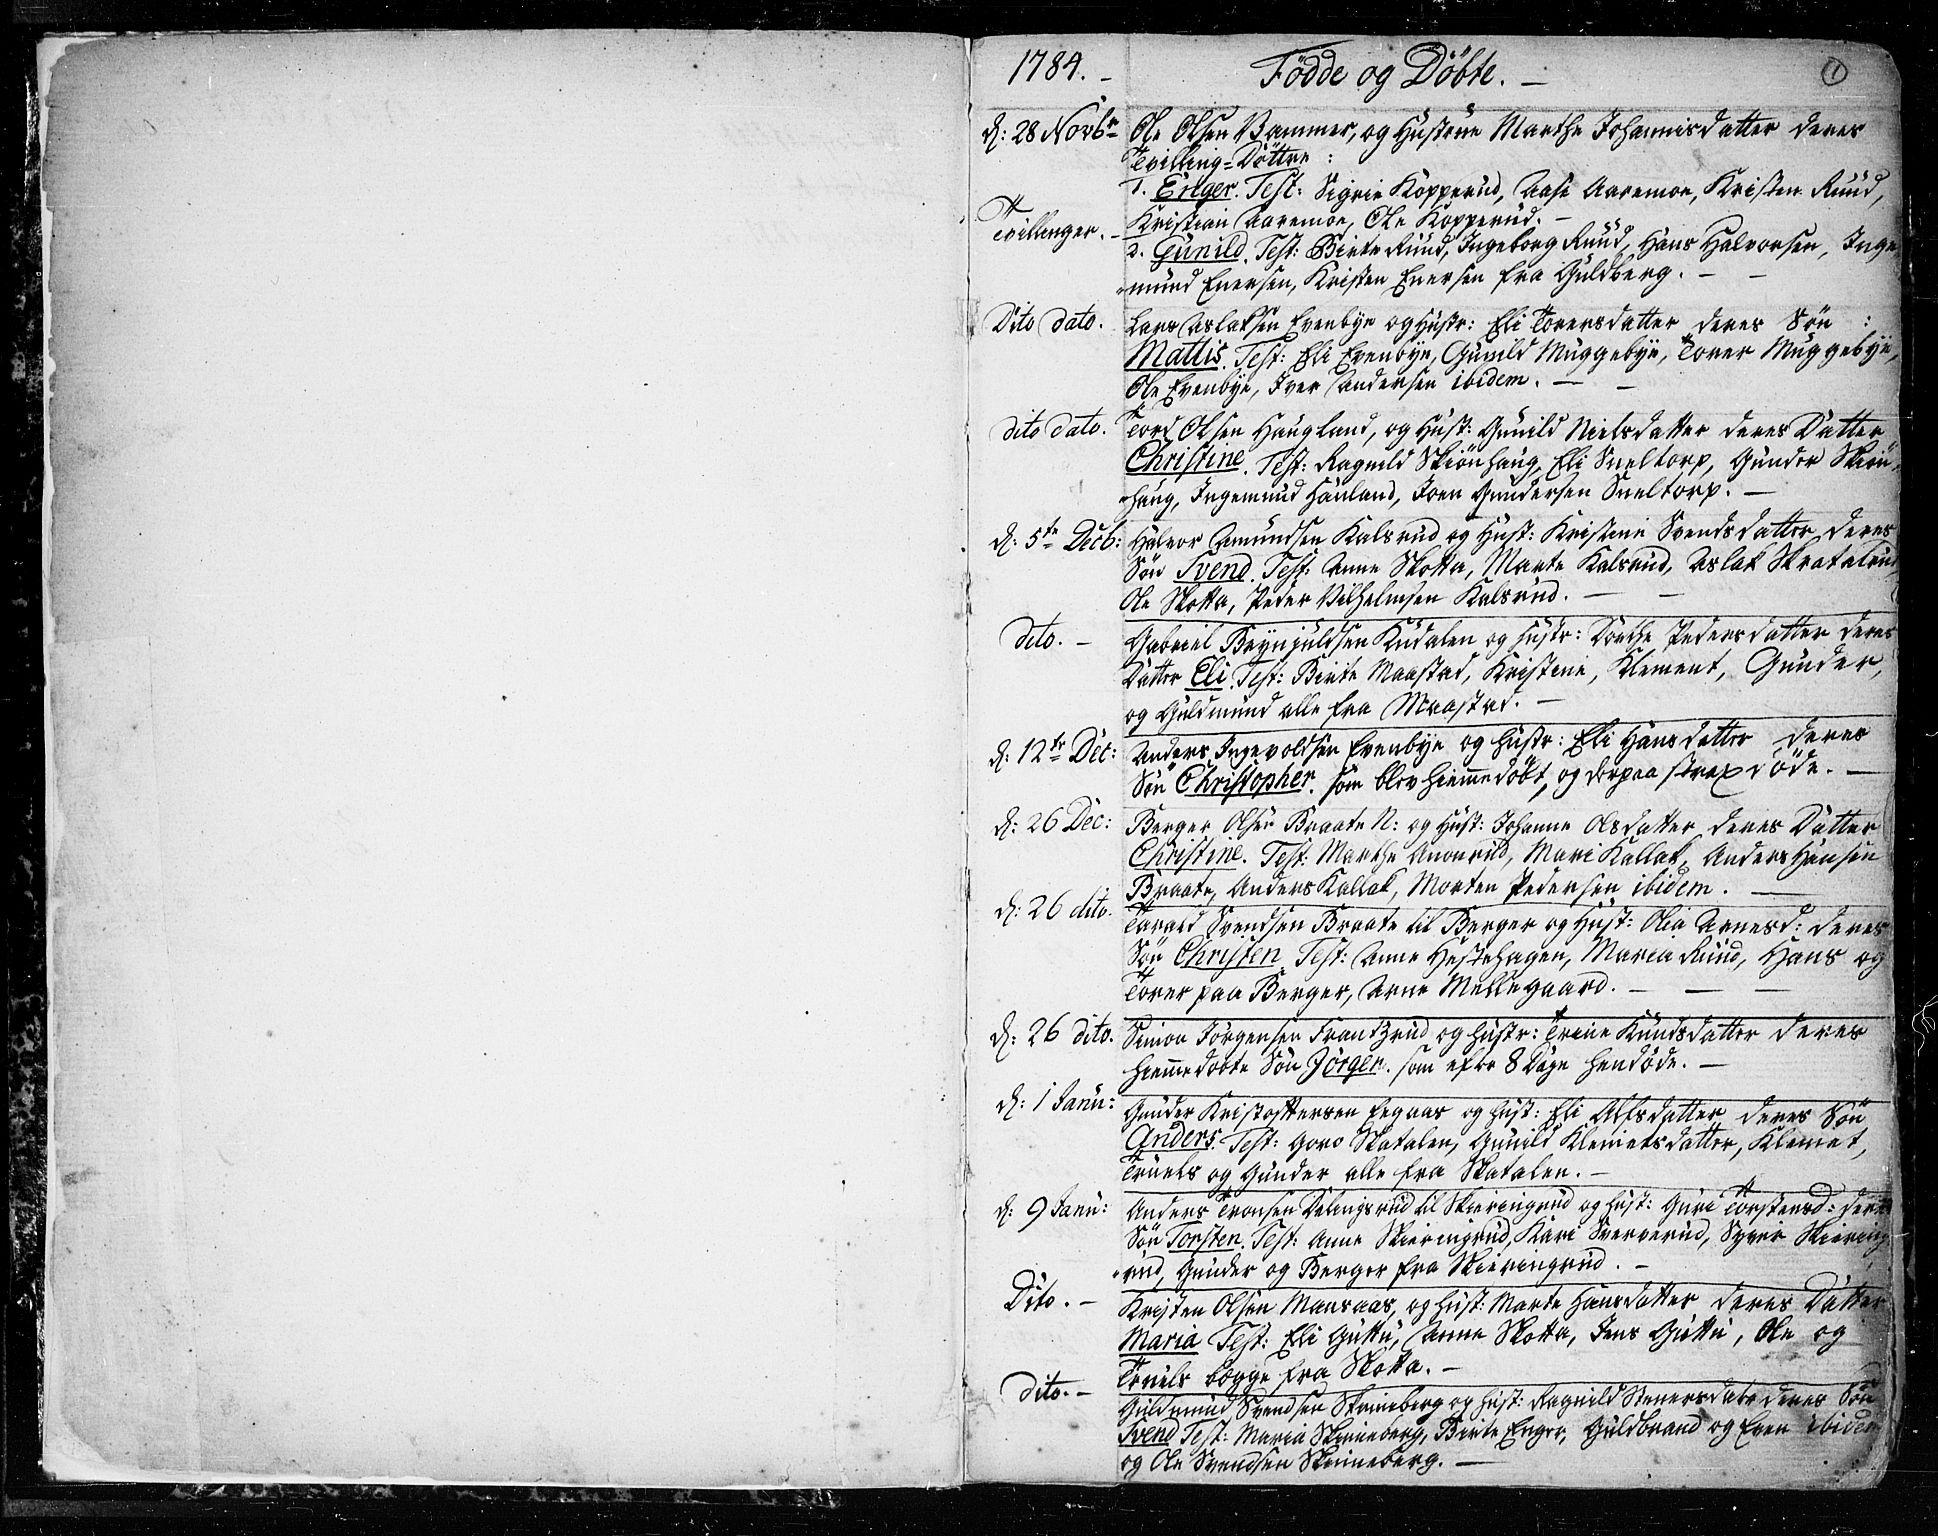 SAO, Trøgstad prestekontor Kirkebøker, F/Fa/L0005: Parish register (official) no. I 5, 1784-1814, p. 1